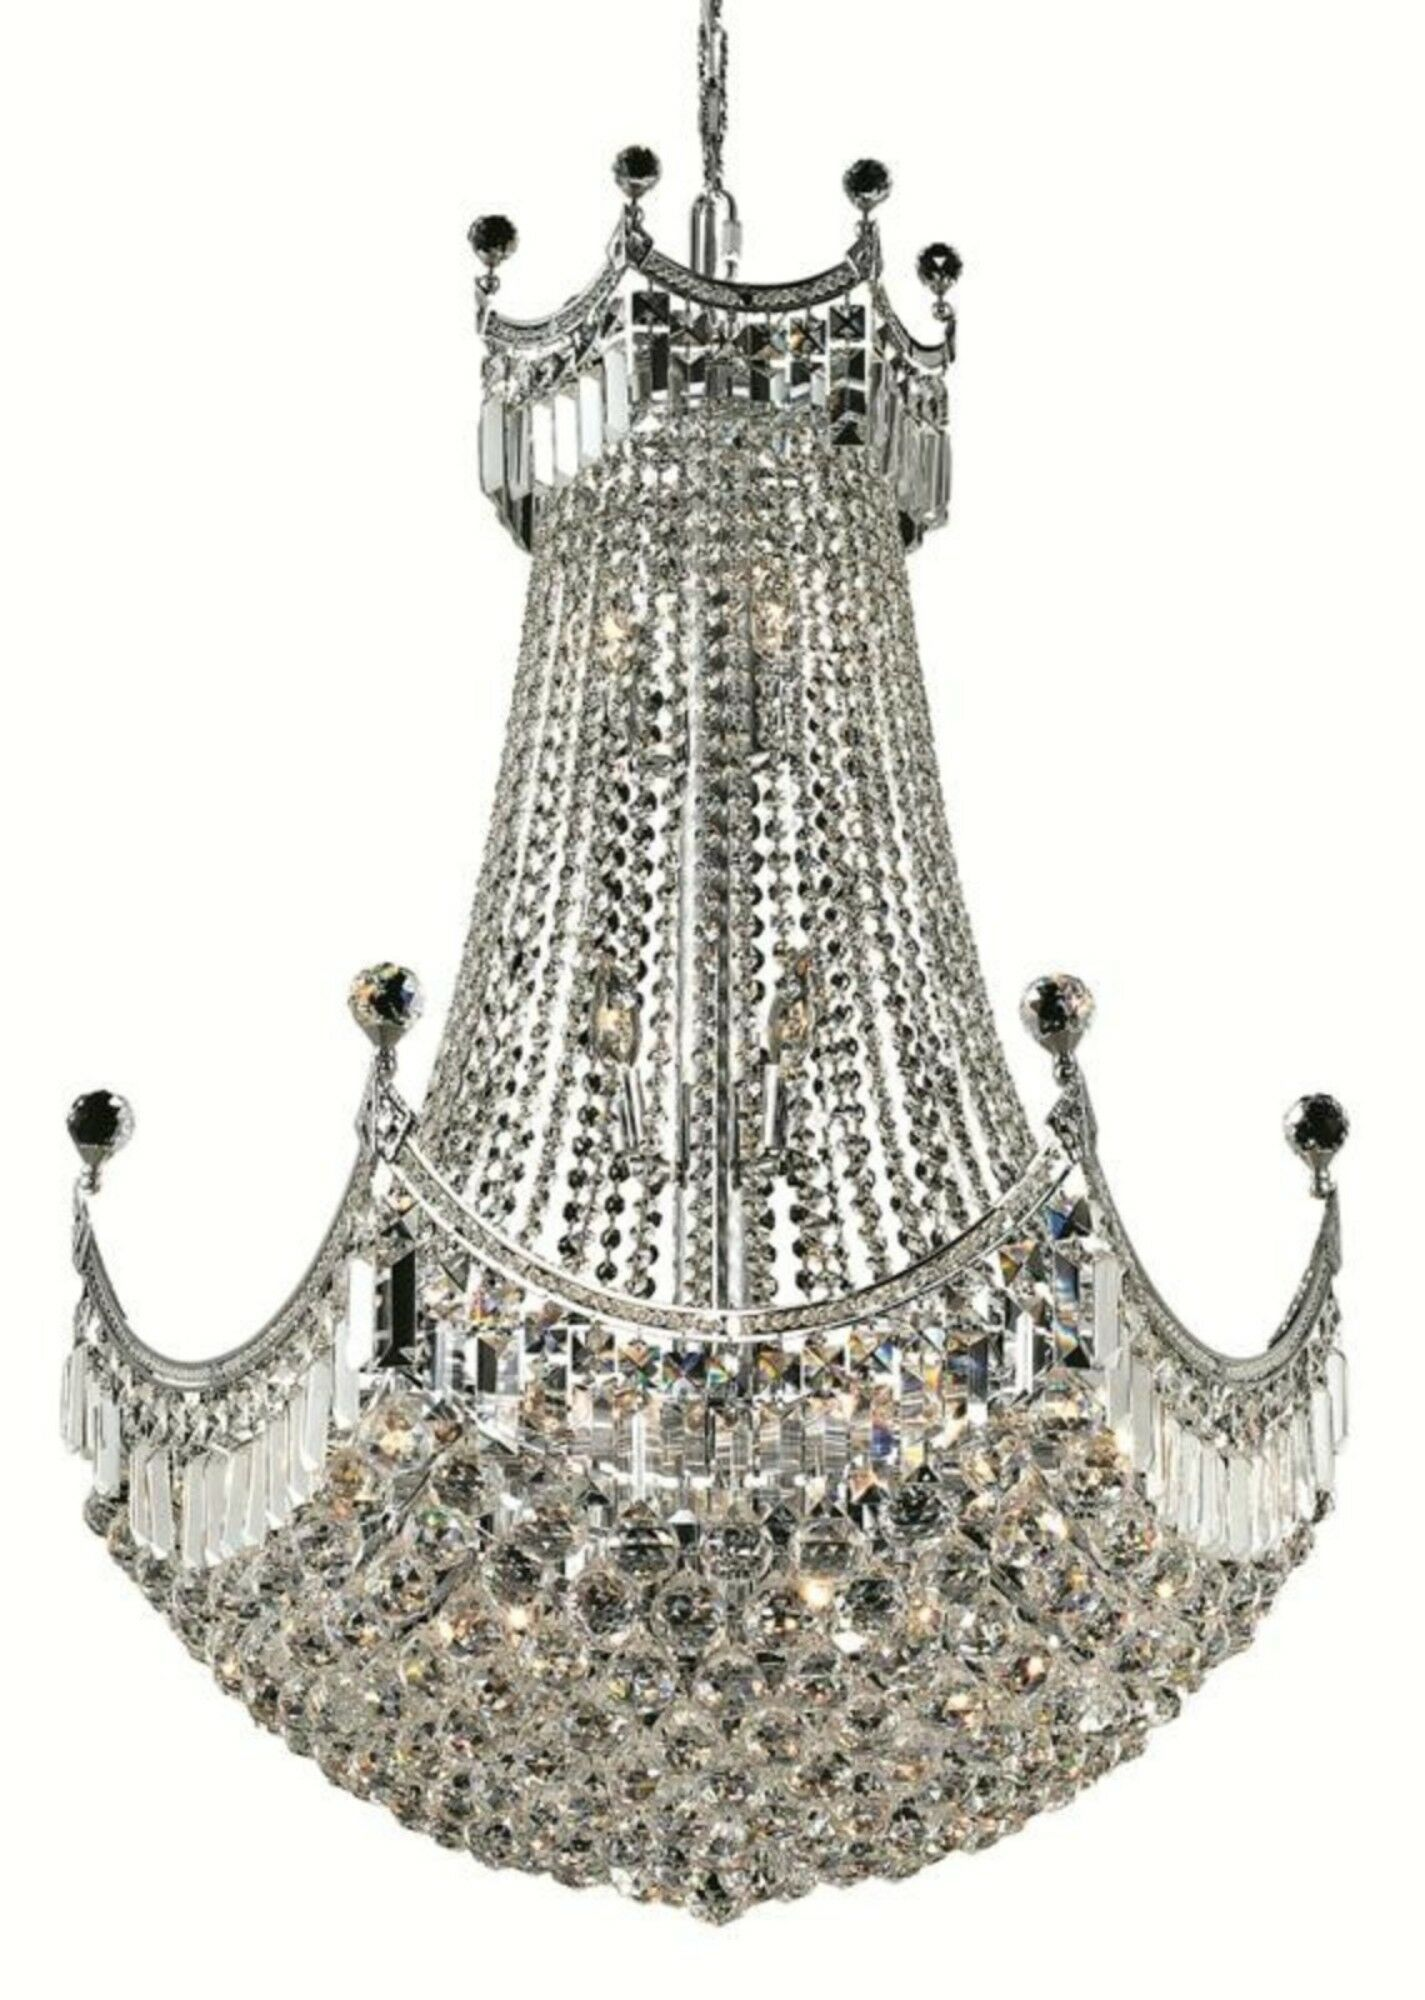 Kasha 24-Light Empire Chandelier Finish: Chrome, Crystal: Royal Cut